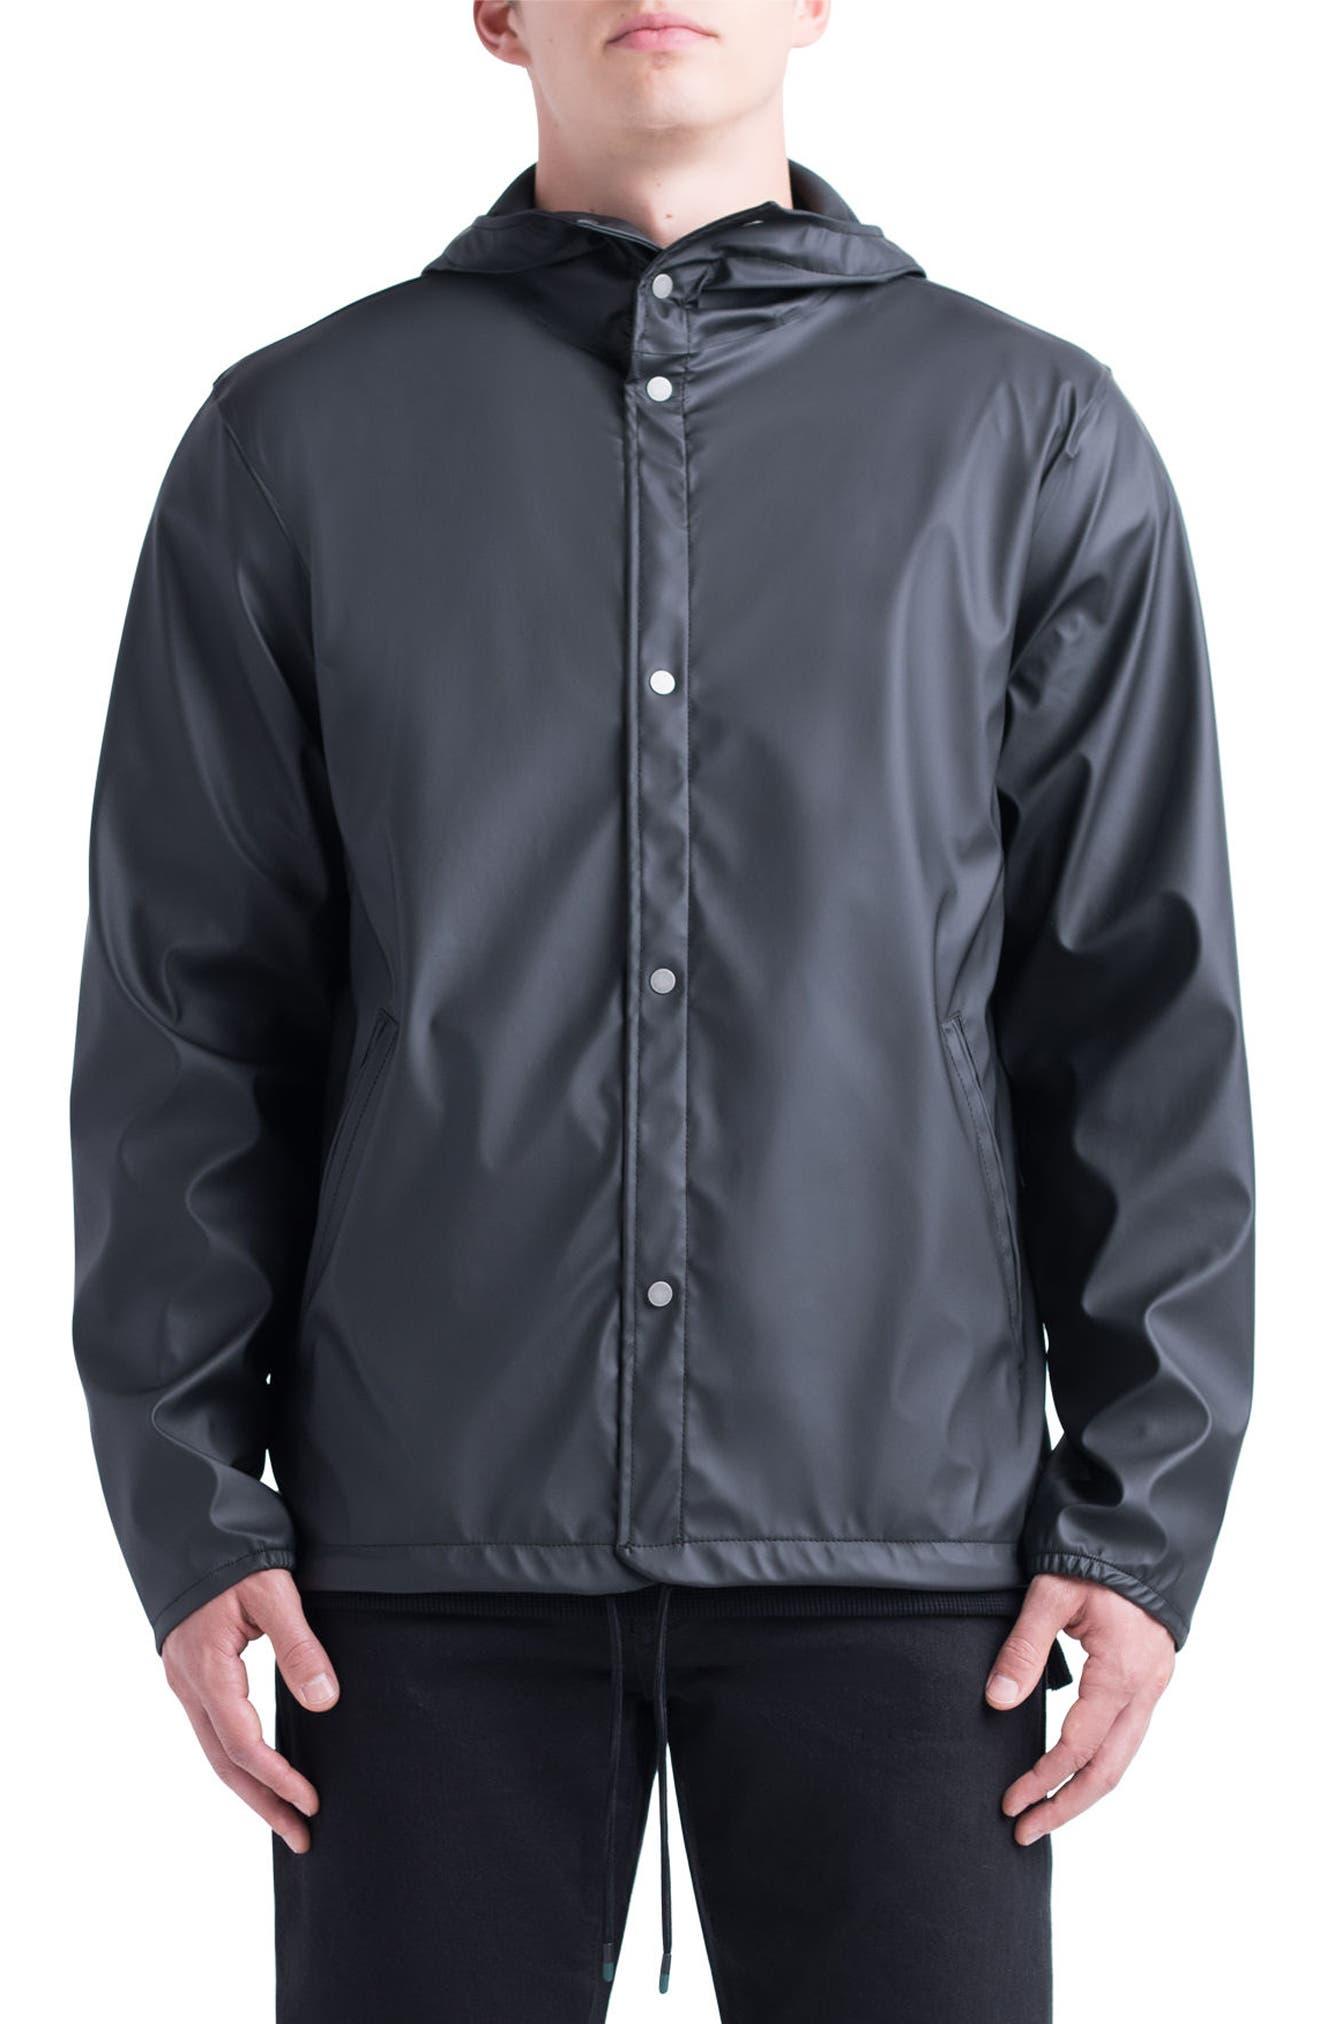 Forecast Hooded Coaches Jacket,                         Main,                         color, Black